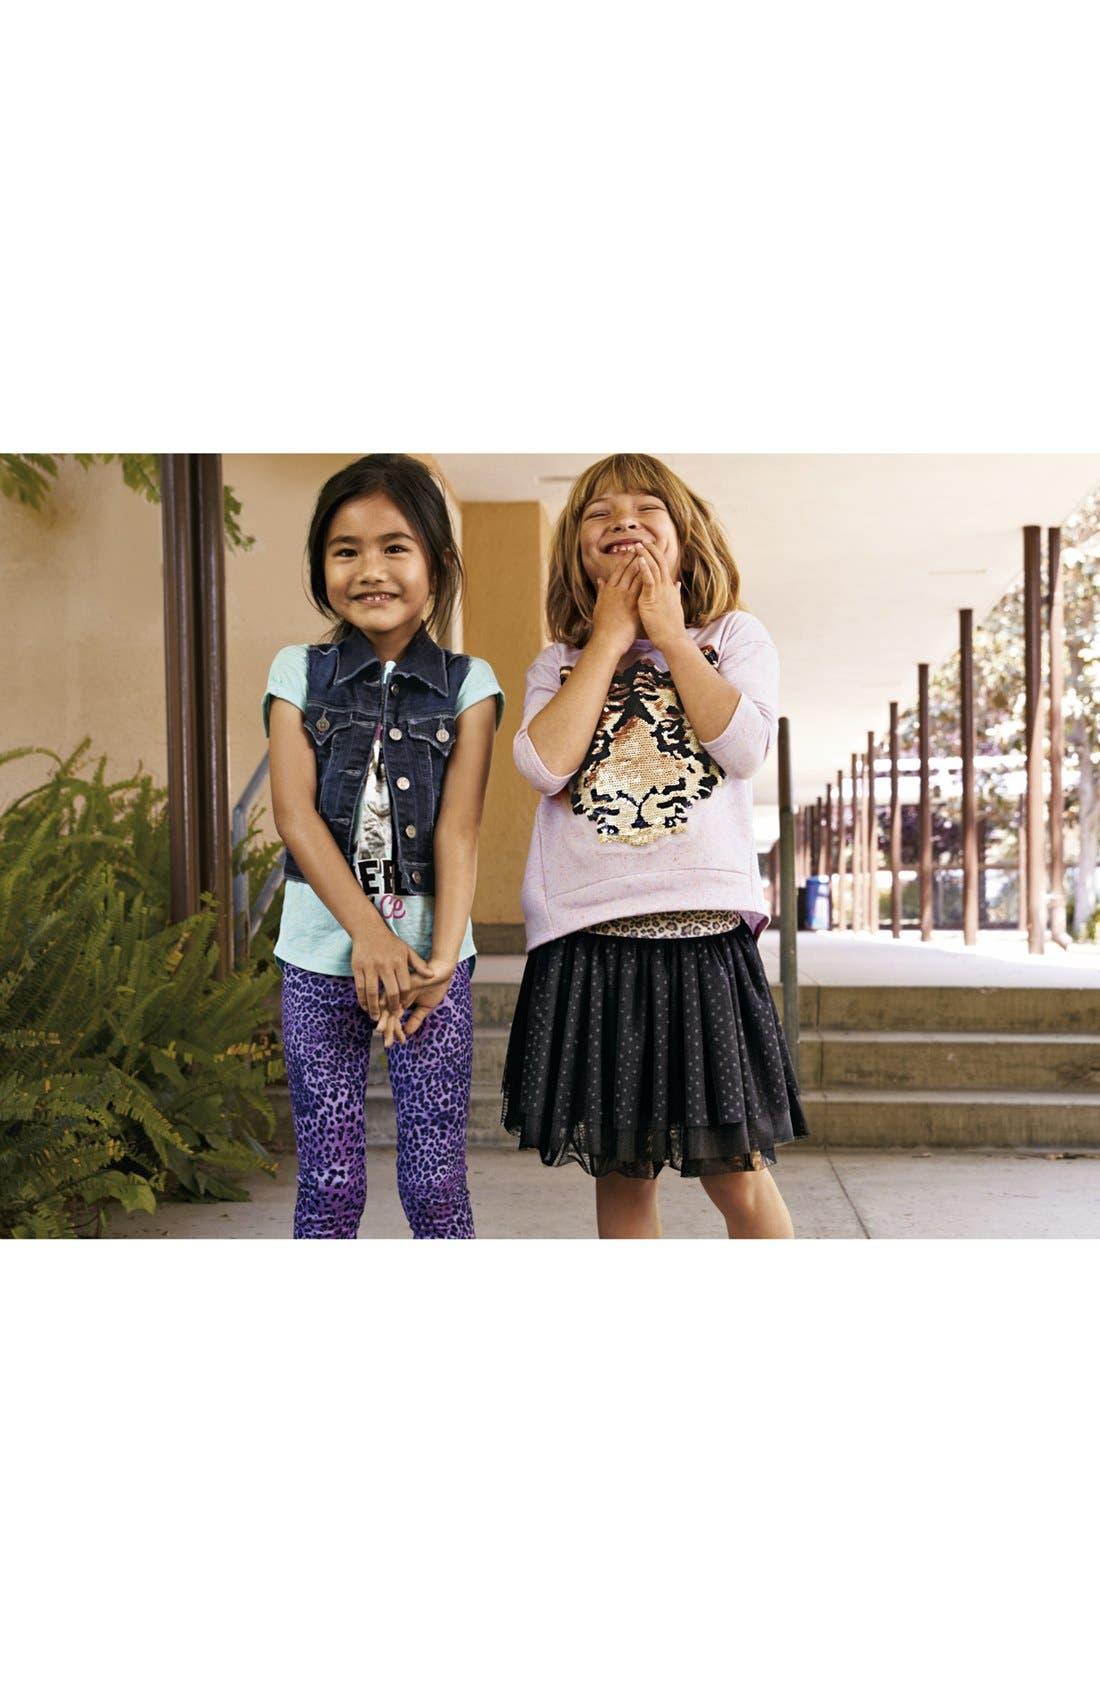 Alternate Image 1 Selected - Tractor Vest, Miken Clothing Tee & TA-EAM Leggings and Kiddo Top & Tutu (Little Girls)